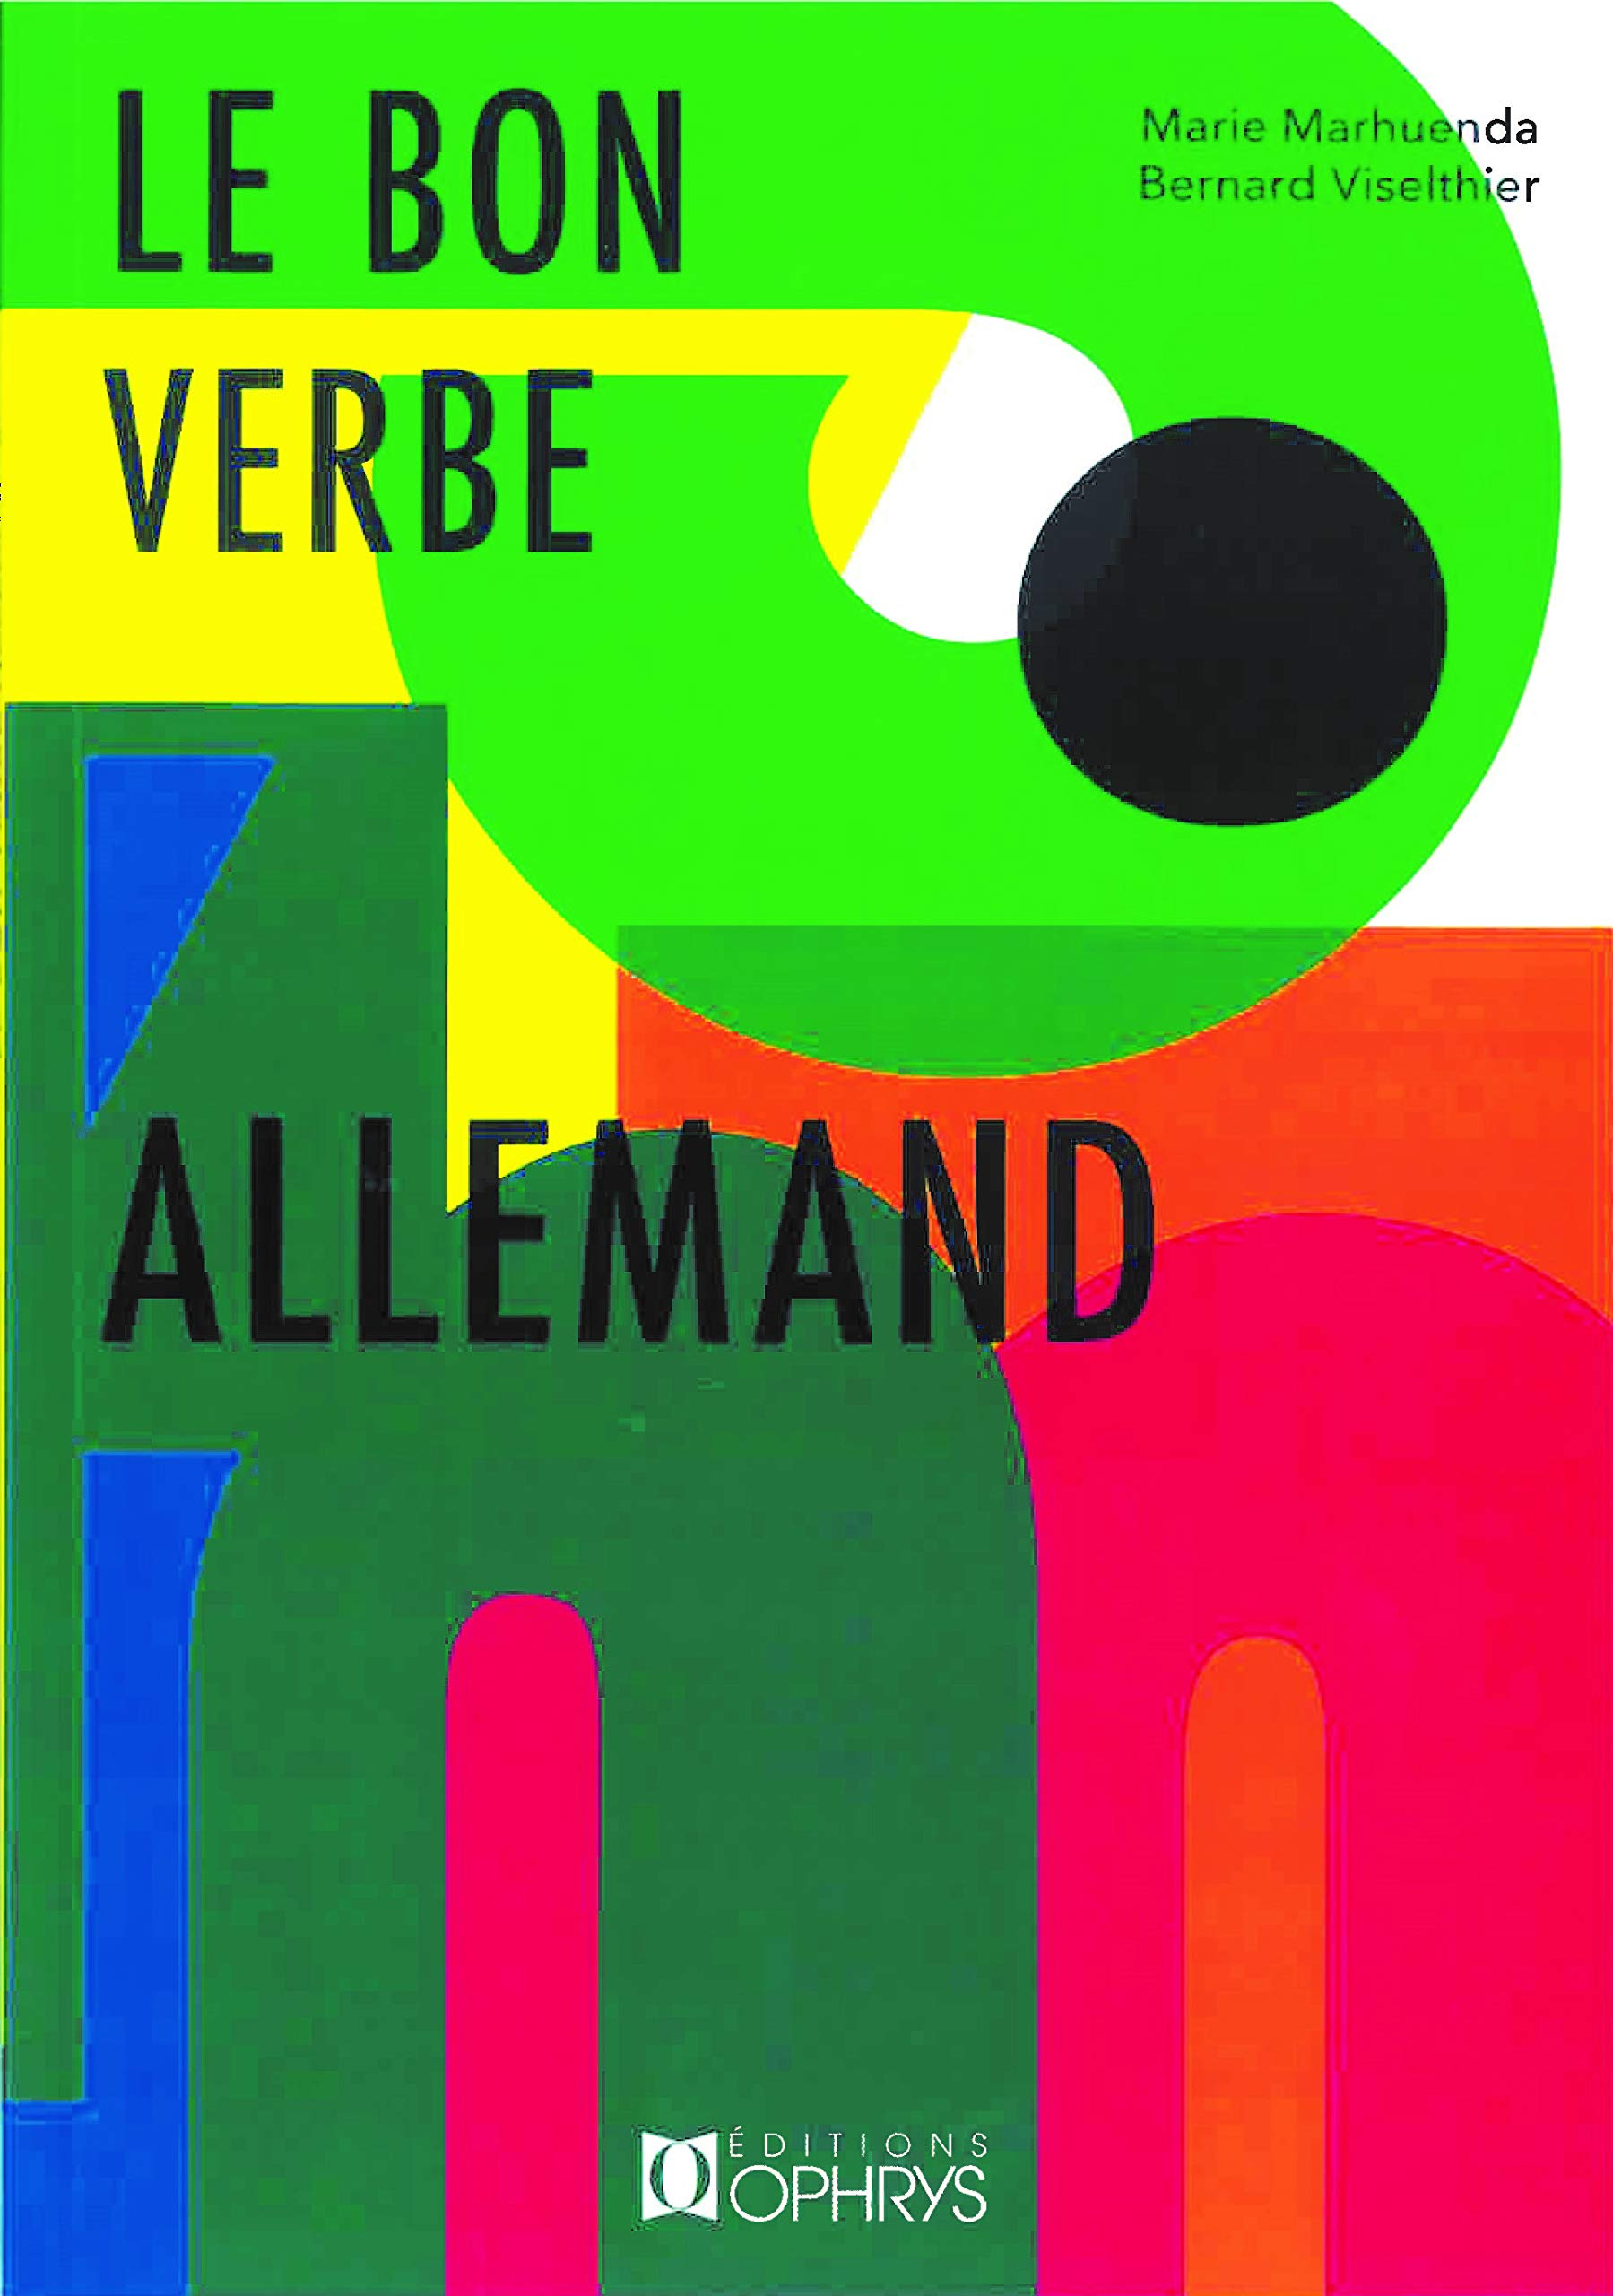 Amazon Fr Le Bon Verbe Allemand Marhuenda Marie Viselthier Bernard Livres